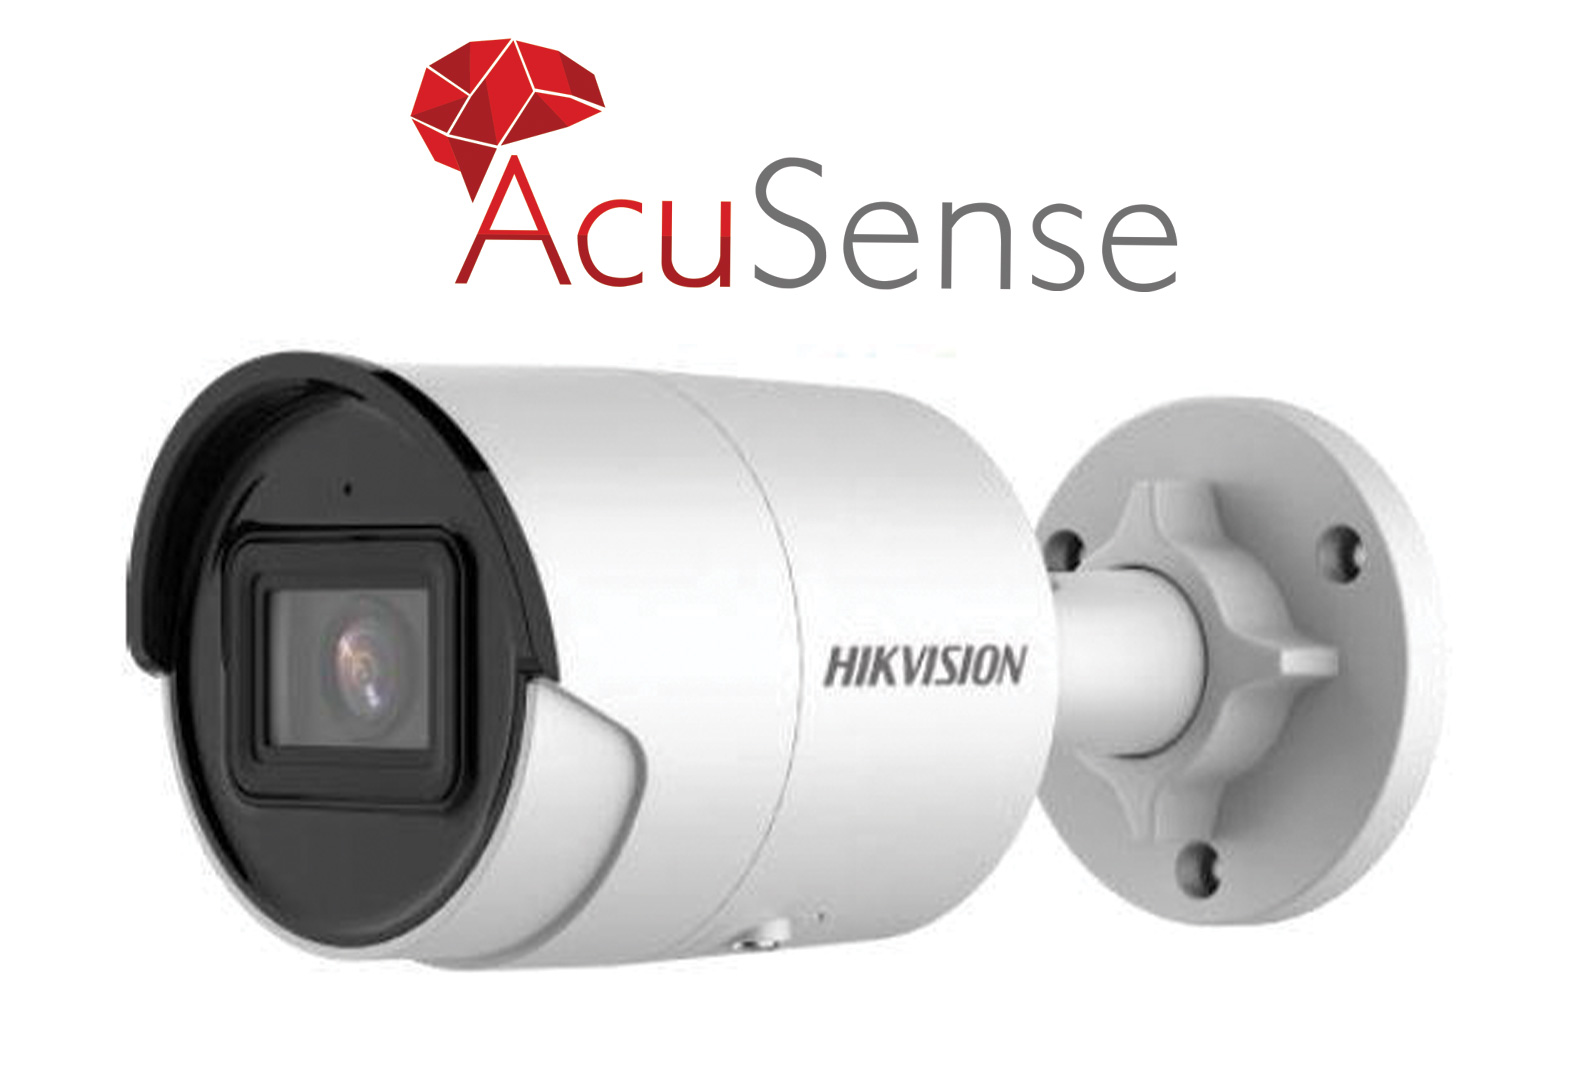 Hikvision-DS-2CD2046G2-I4mm-IP-Bullet-Ueberwachung-Kamera.jpg